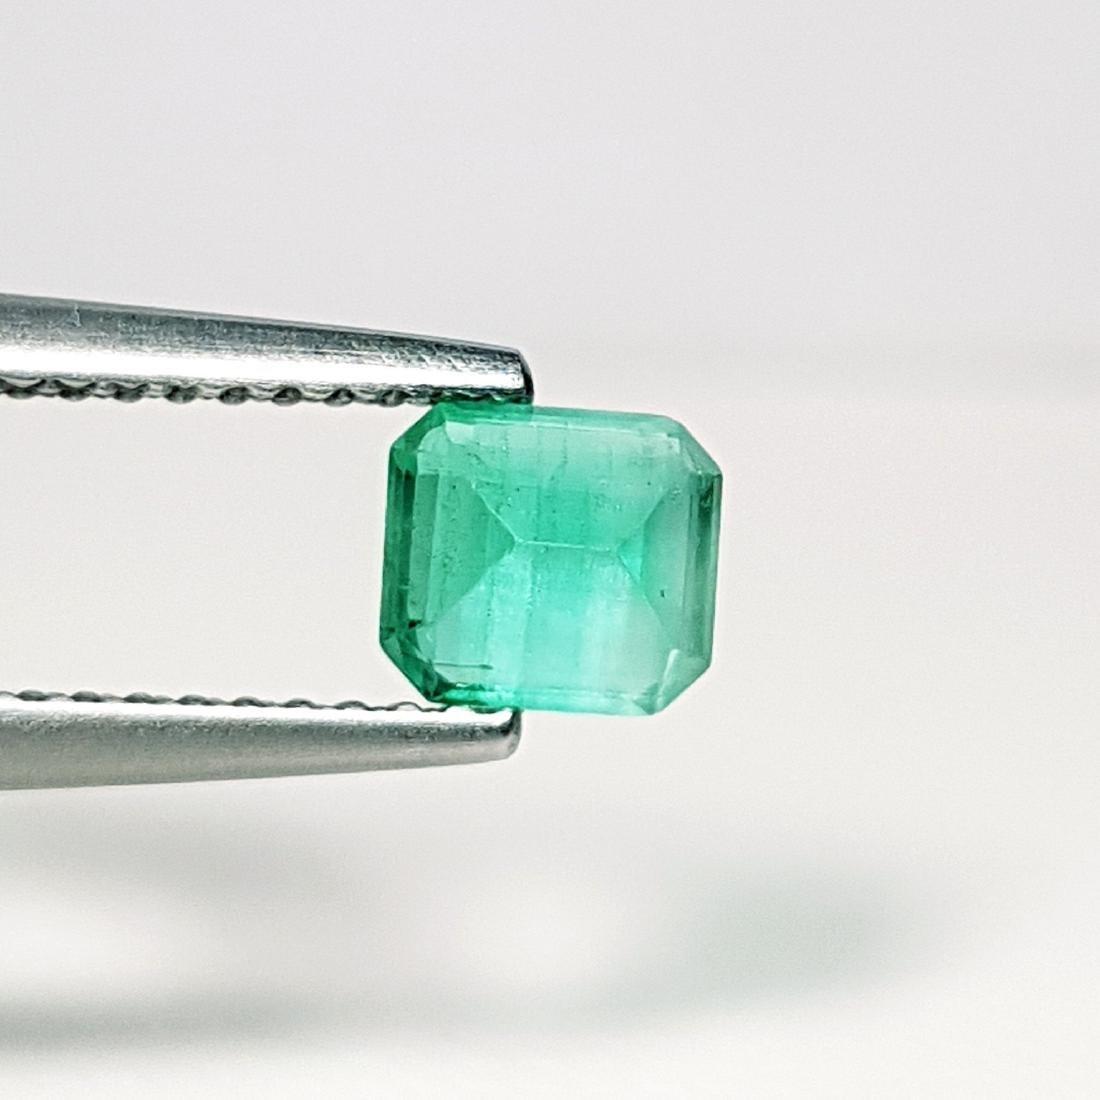 Top Qaulity Emerald Cut NaturalEmerald - 0.63 ct - 3